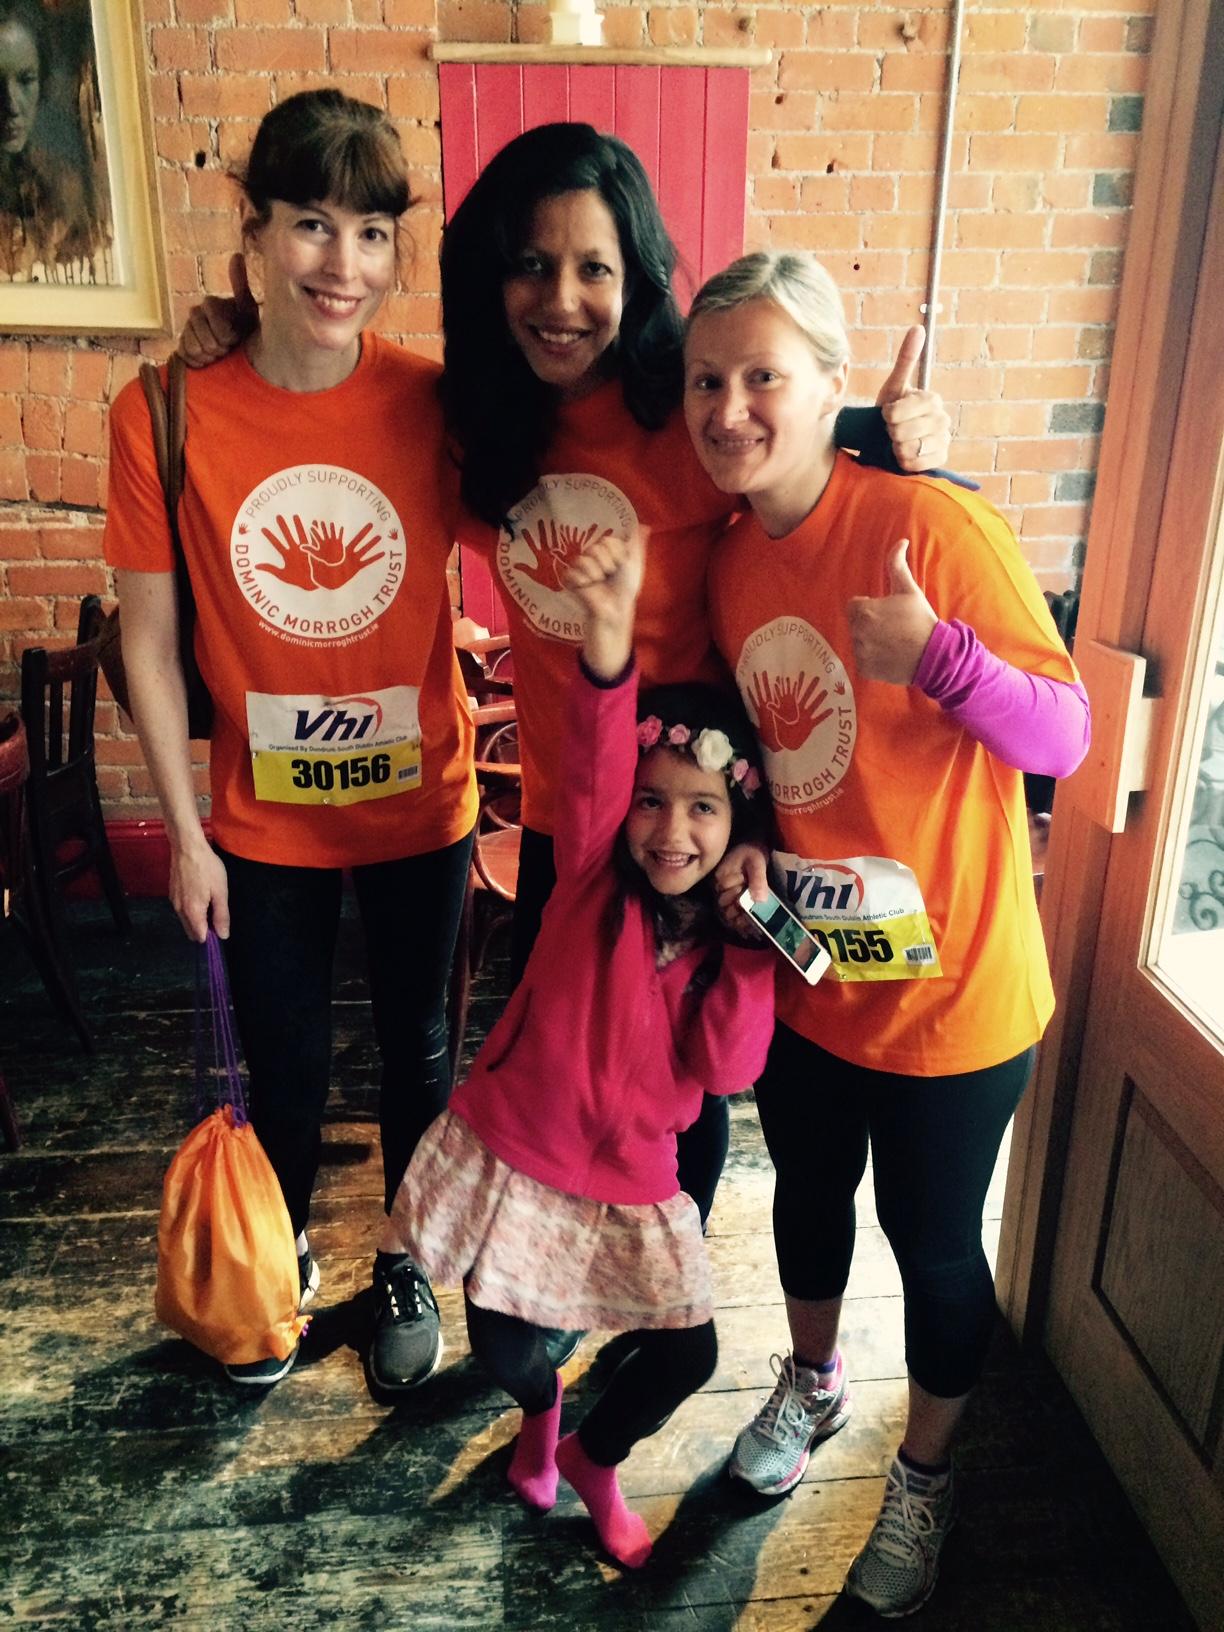 Dublinminimarathon2.jpg